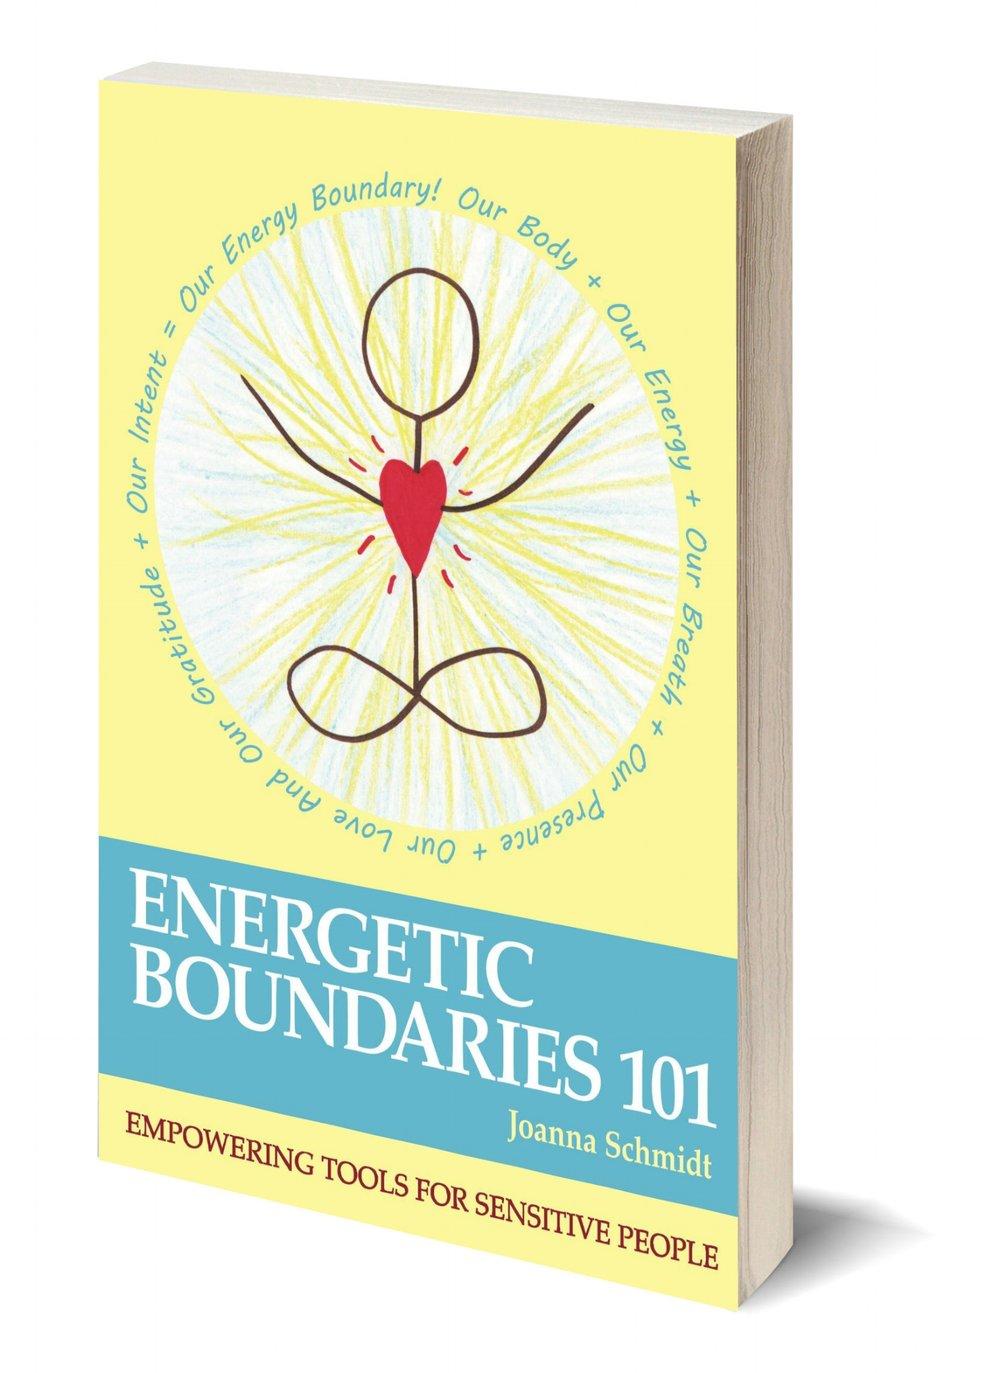 Energy boundaries by Joanna Schmidt